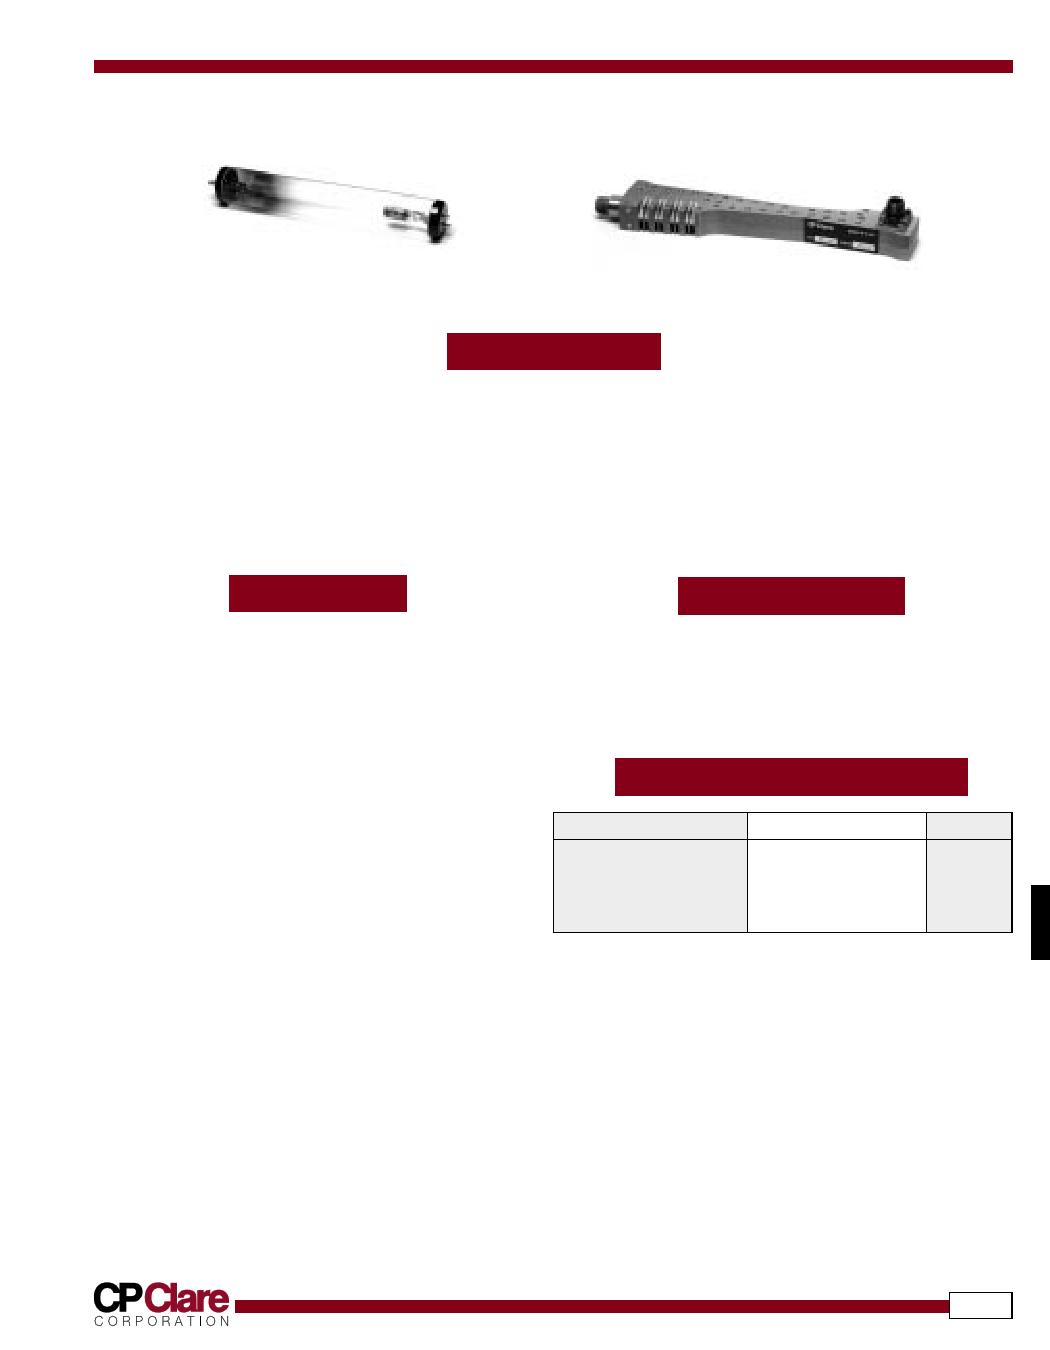 TD-6358 datasheet